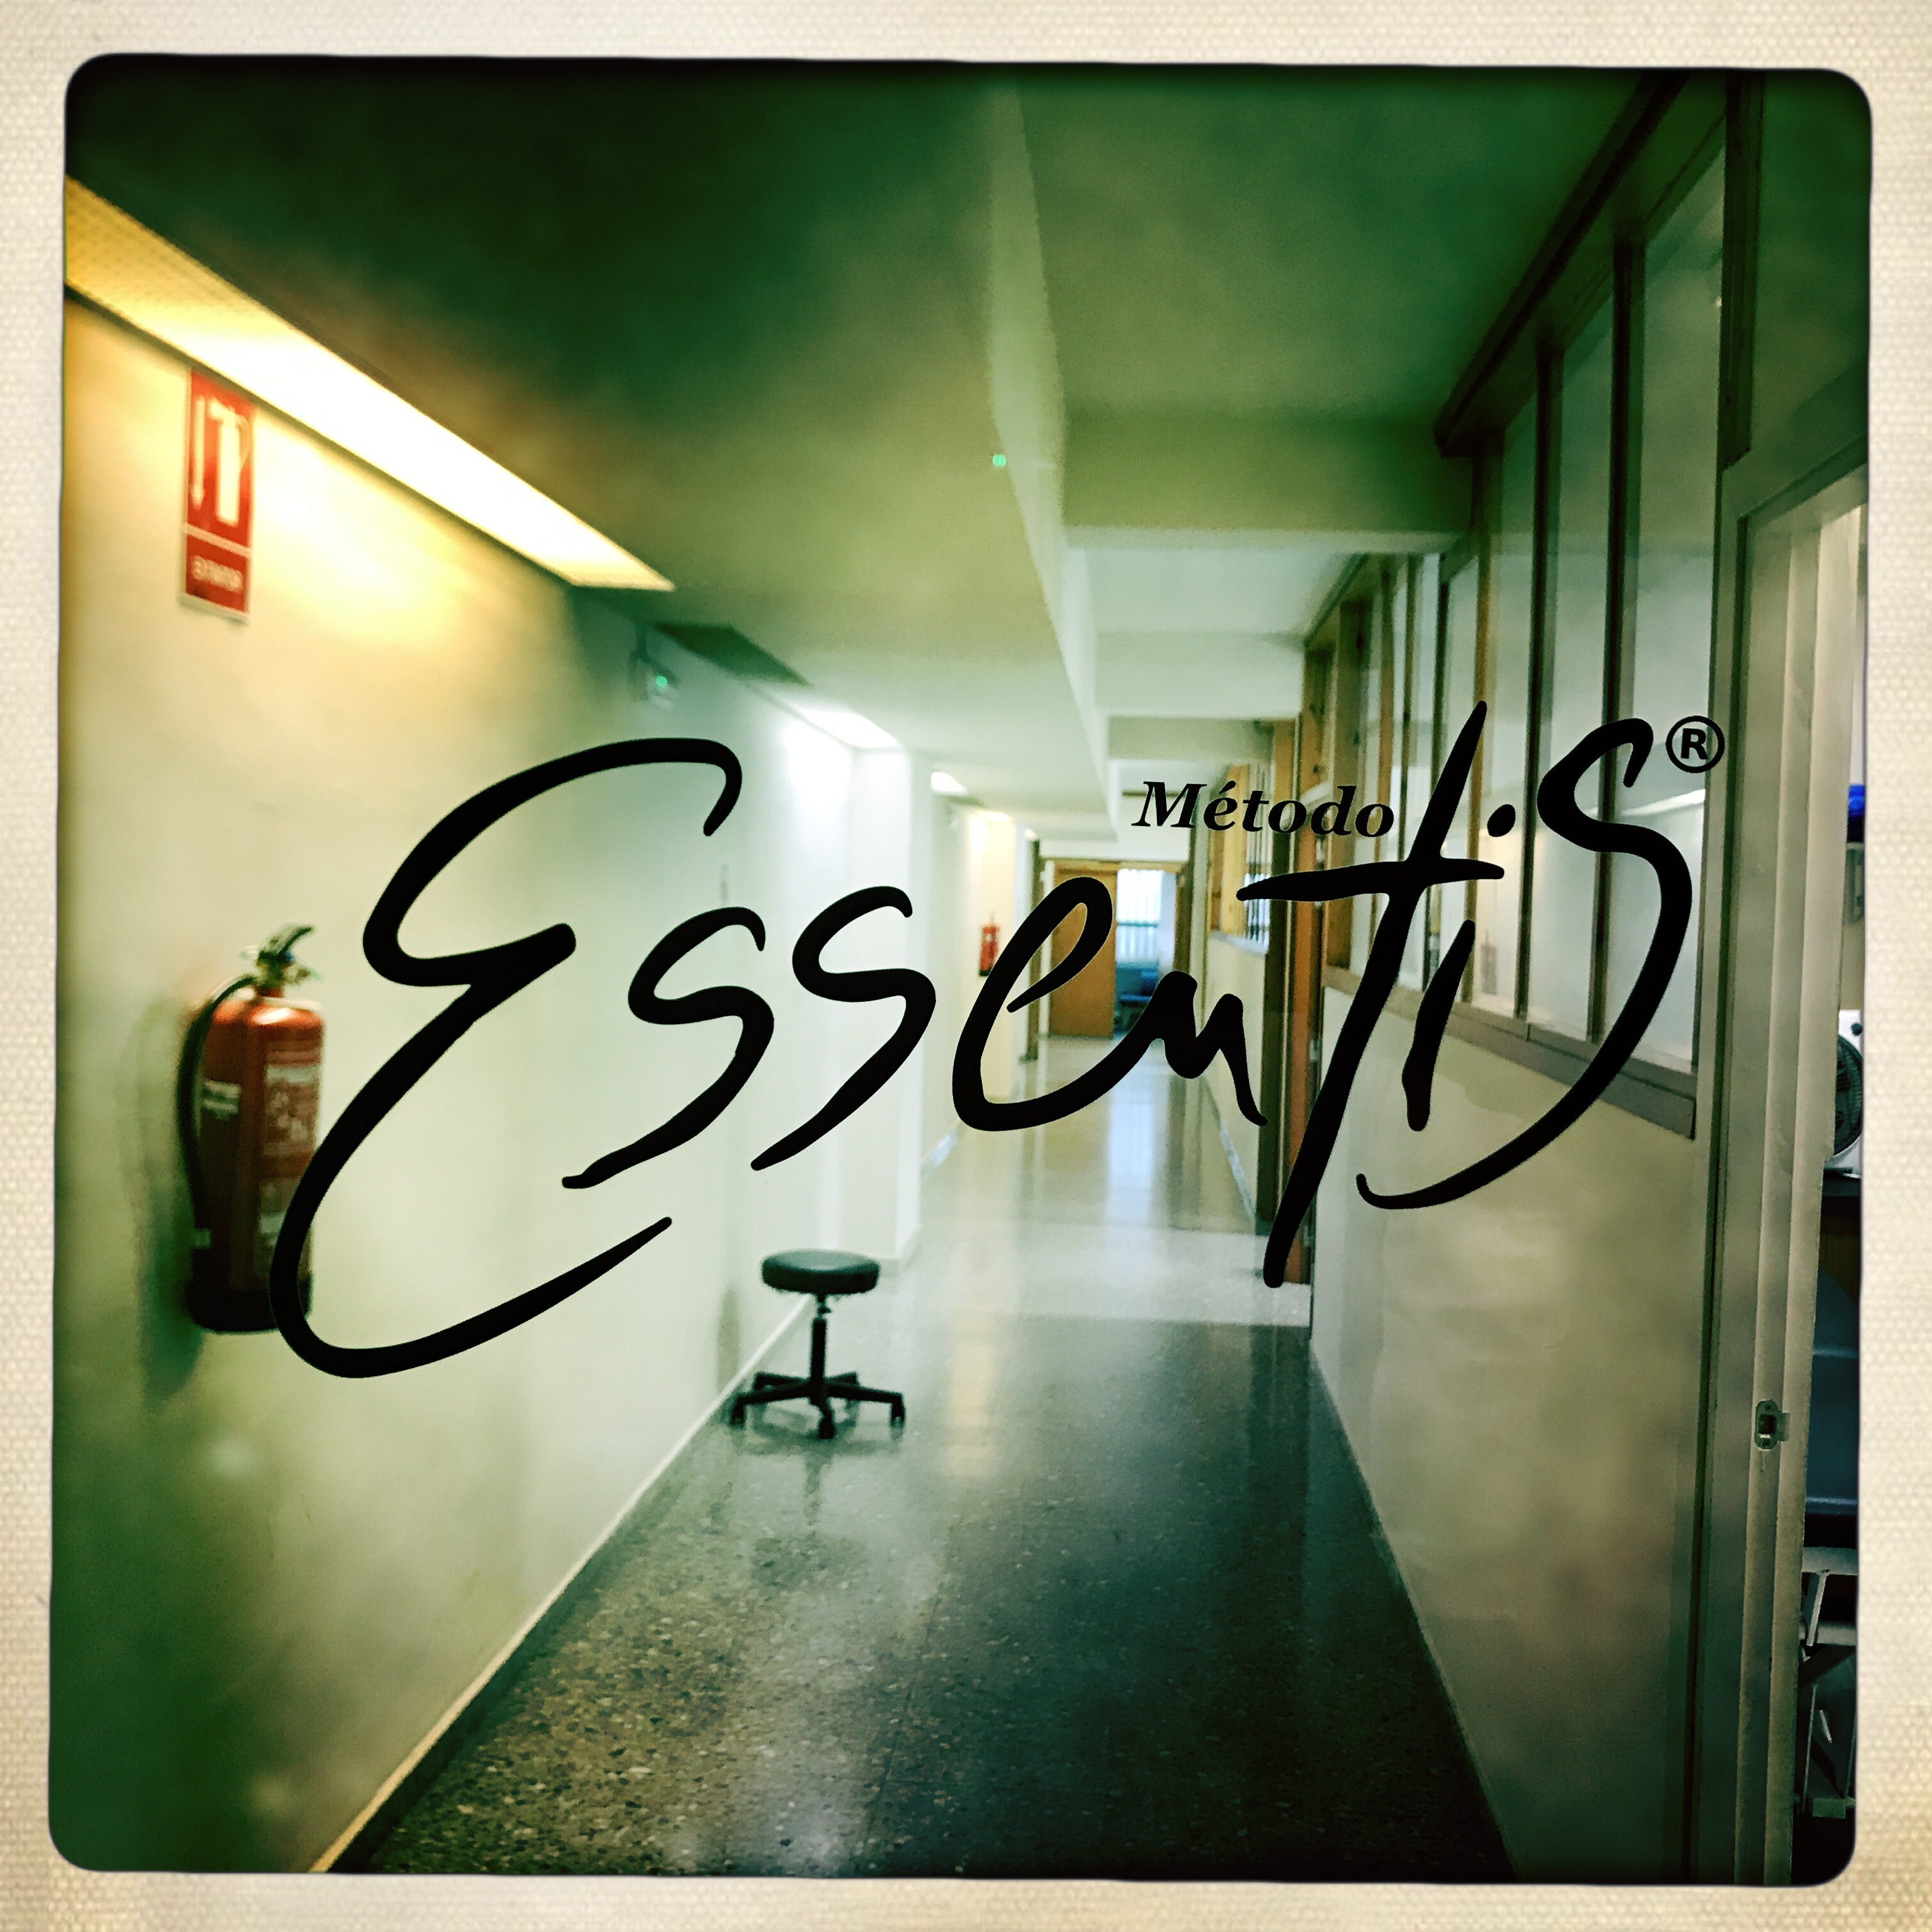 Présentation OM ALIVE à ESSENTIS (Barcelone) – OM ALIVE lecture at Essentis (Barcelona)